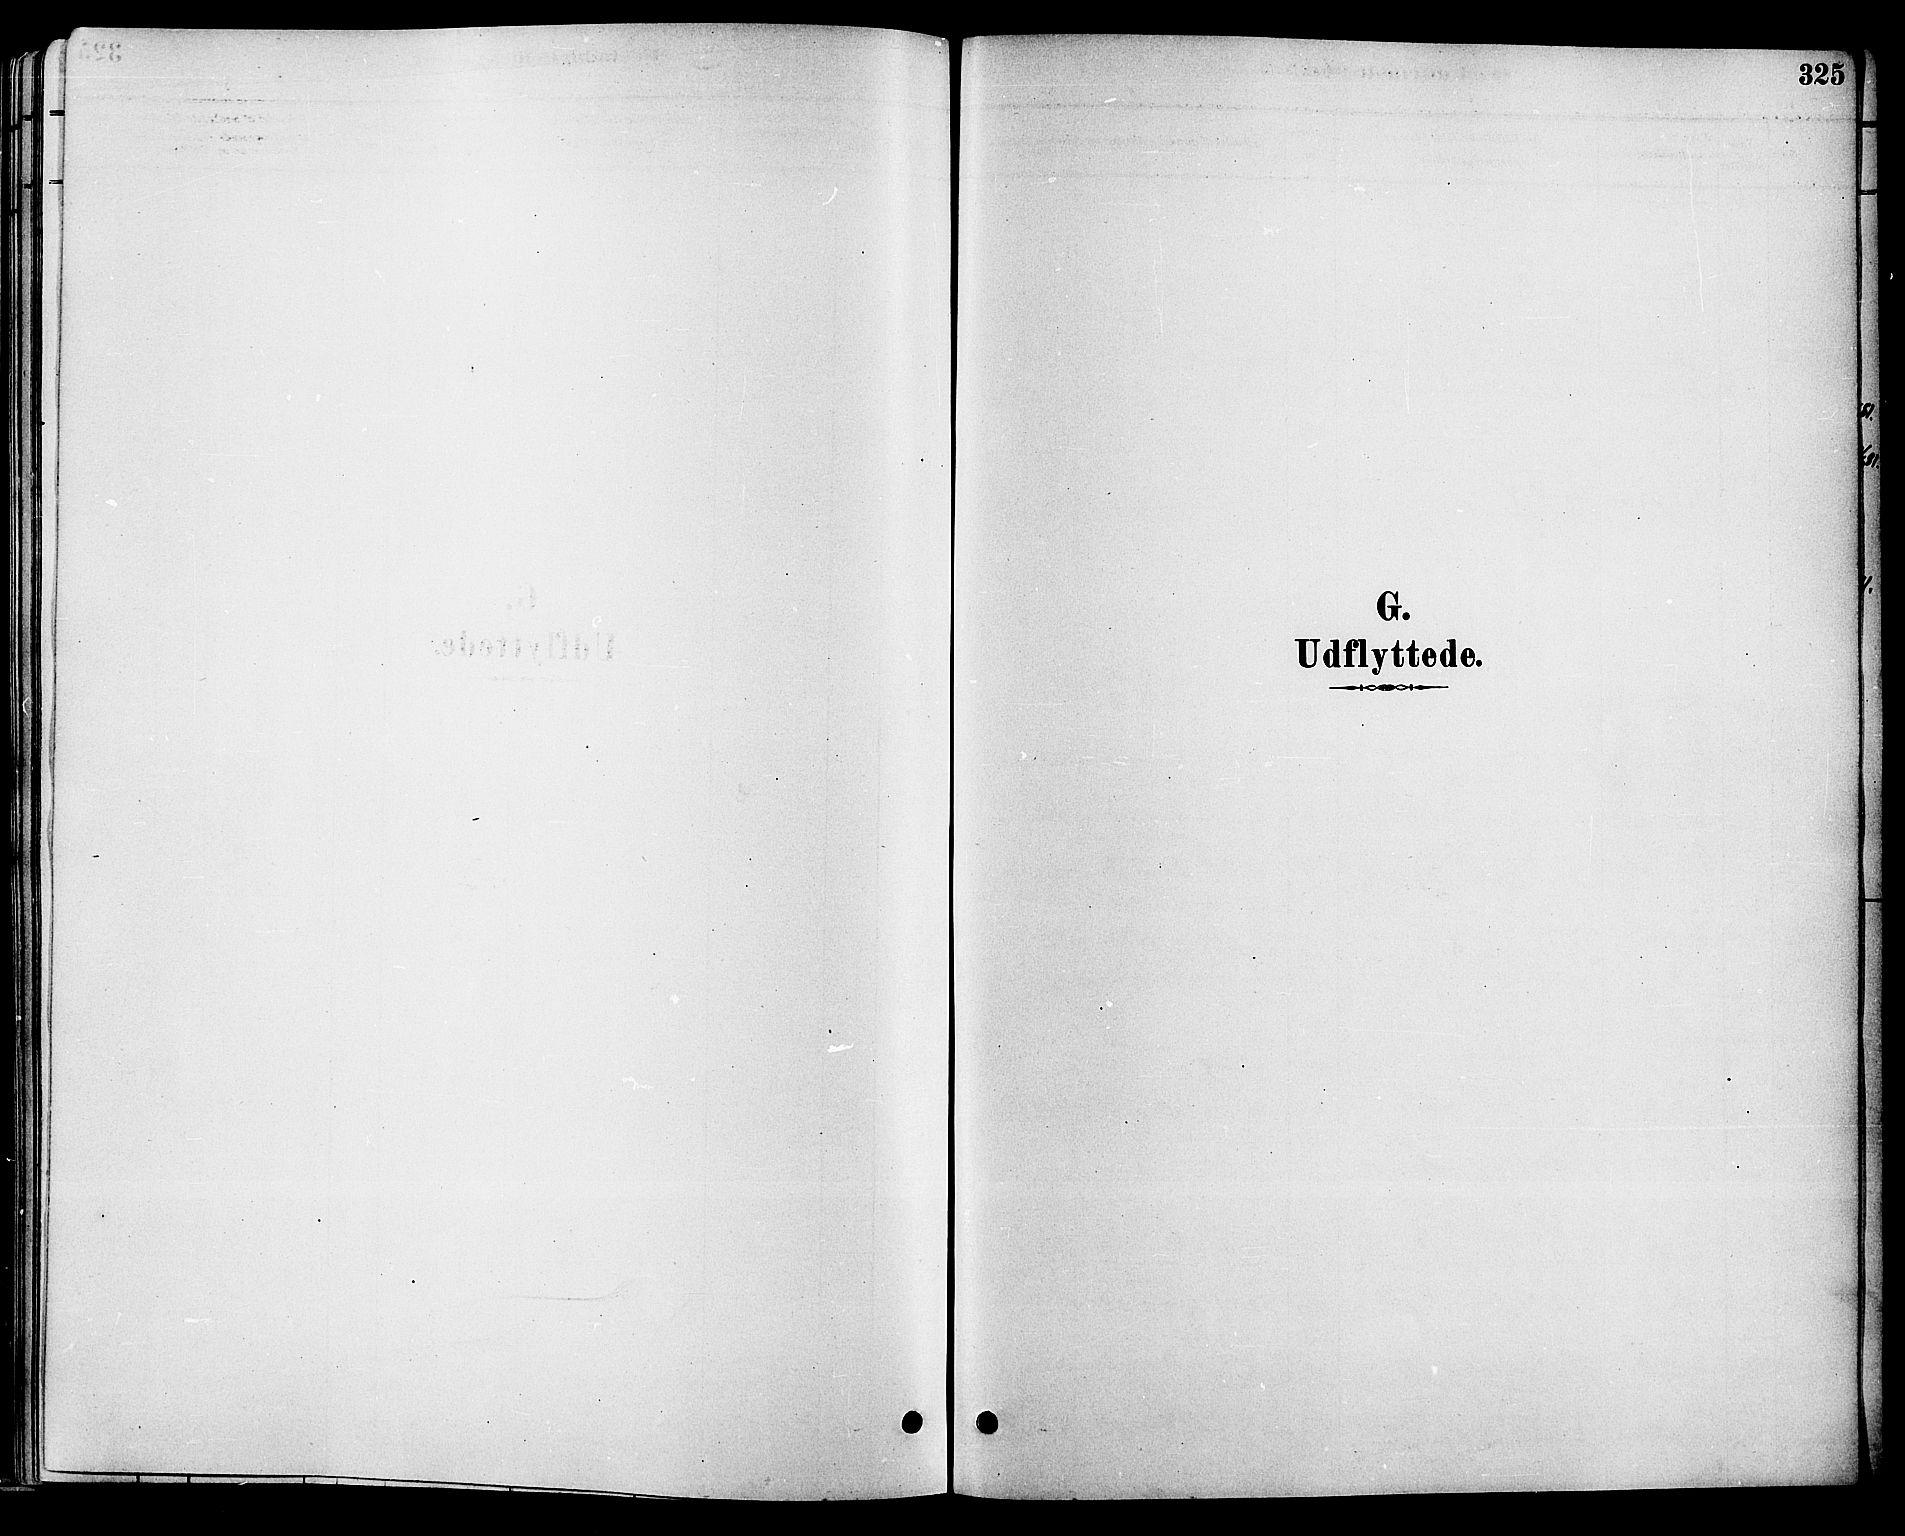 SAKO, Solum kirkebøker, F/Fa/L0009: Ministerialbok nr. I 9, 1877-1887, s. 325